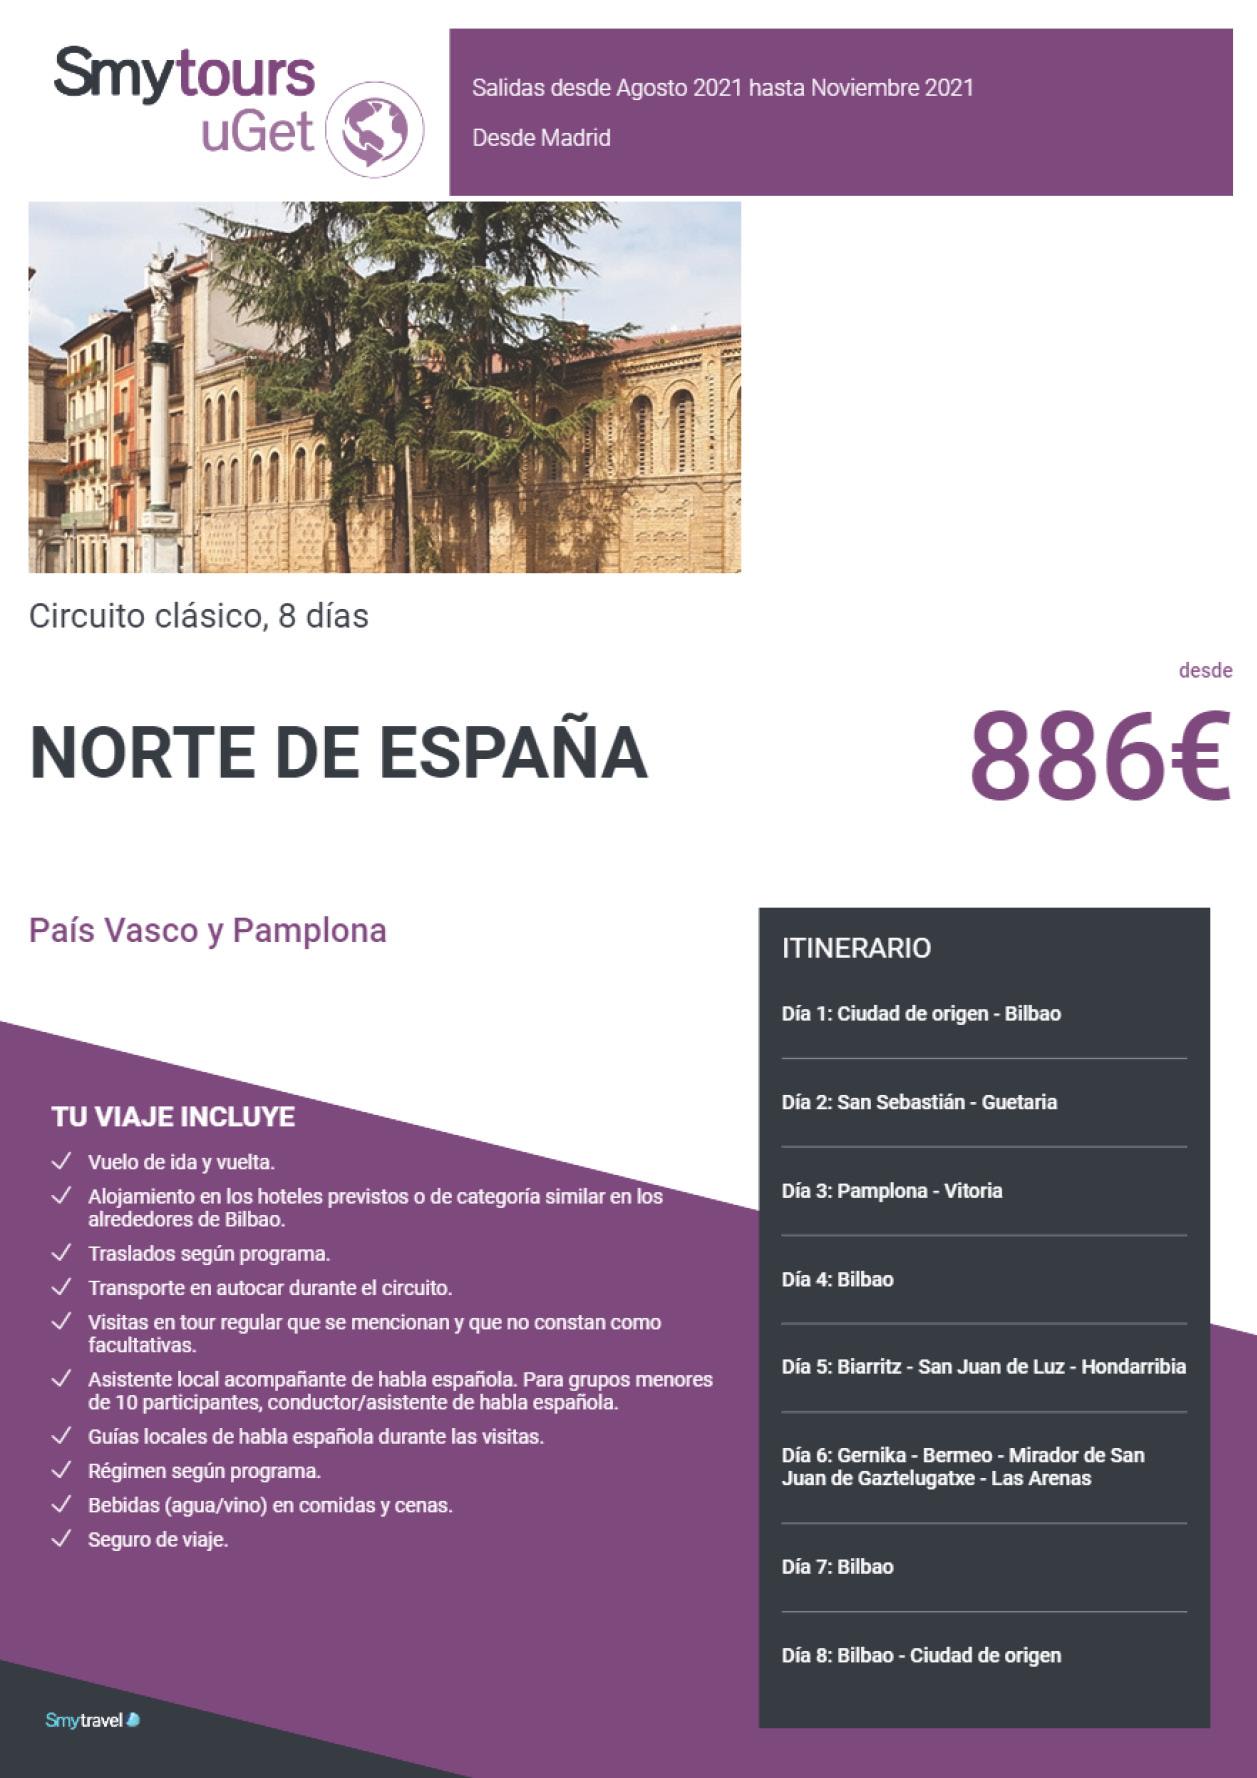 Oferta Smytravel Circuito Pais Vasco y Pamplona 8 dias salidas Madrid desde 886 €